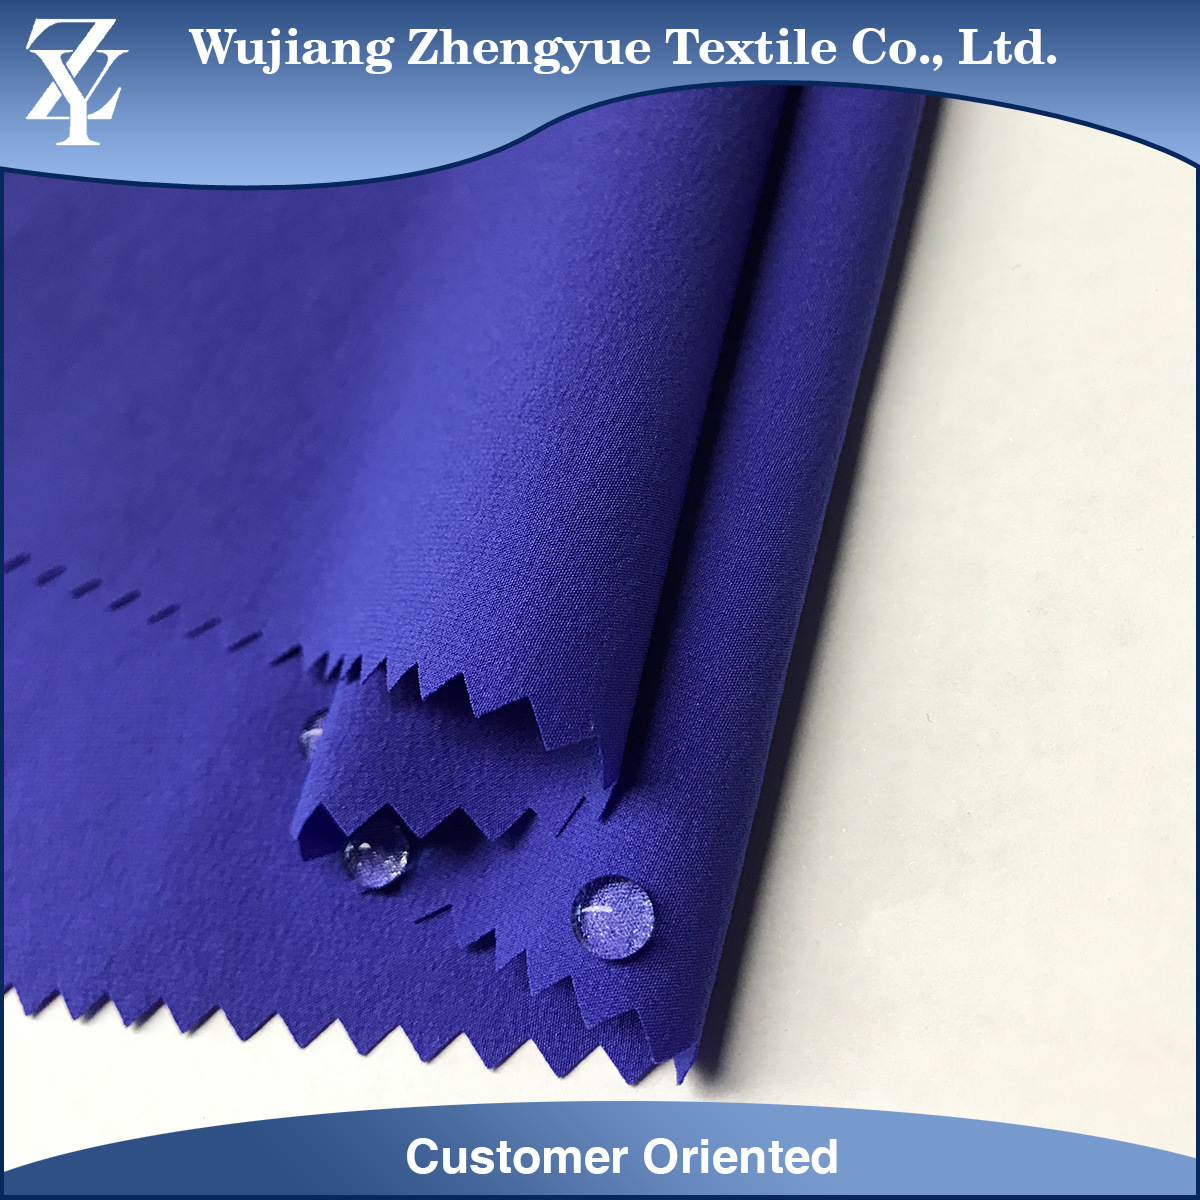 Dobby Waterproof 90% Nylon 10% Spandex Woven 4 Way Stretch Fabric for Garment